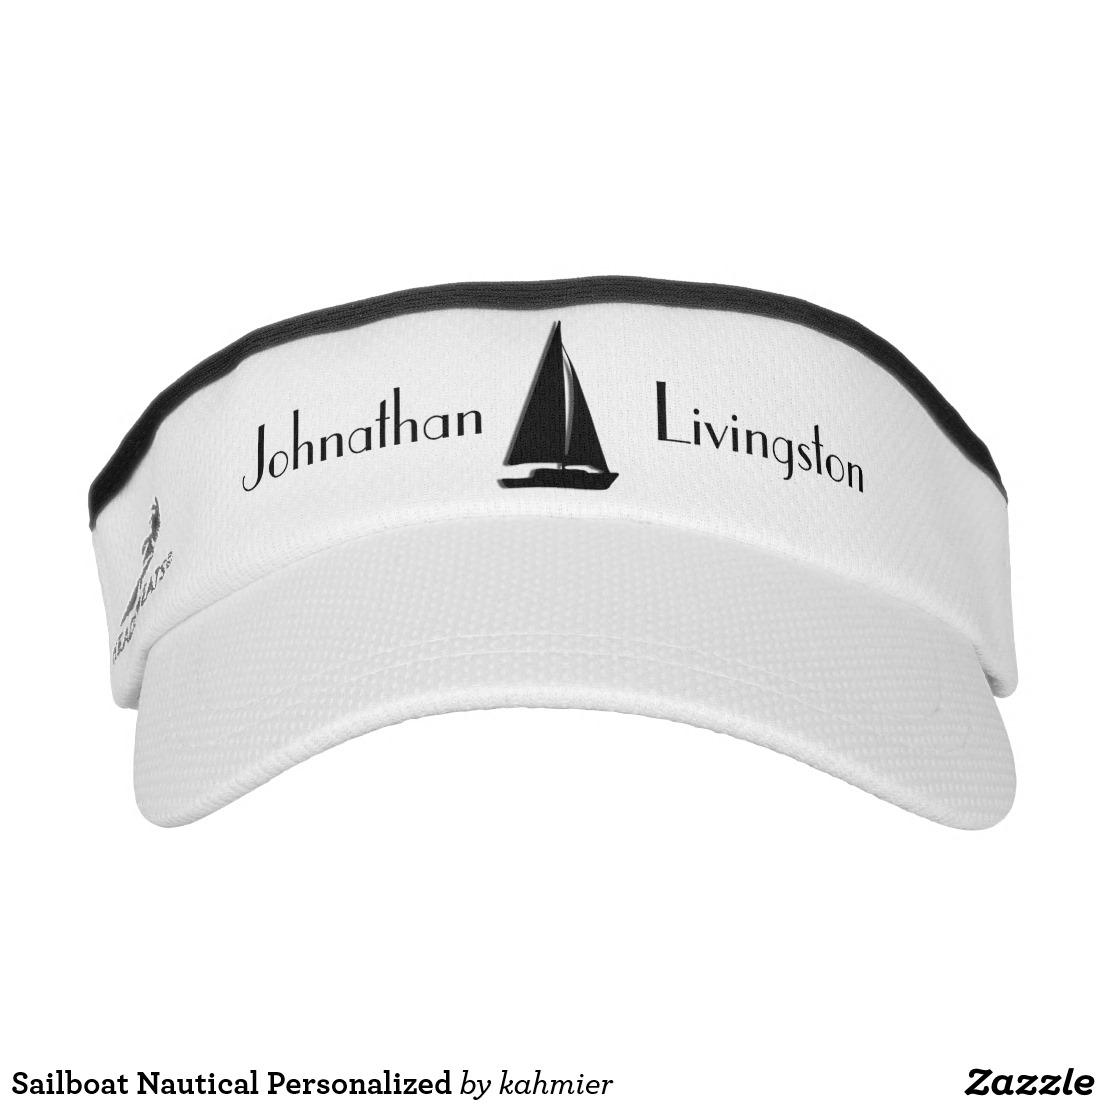 Sailboat Nautical Personalized Visor